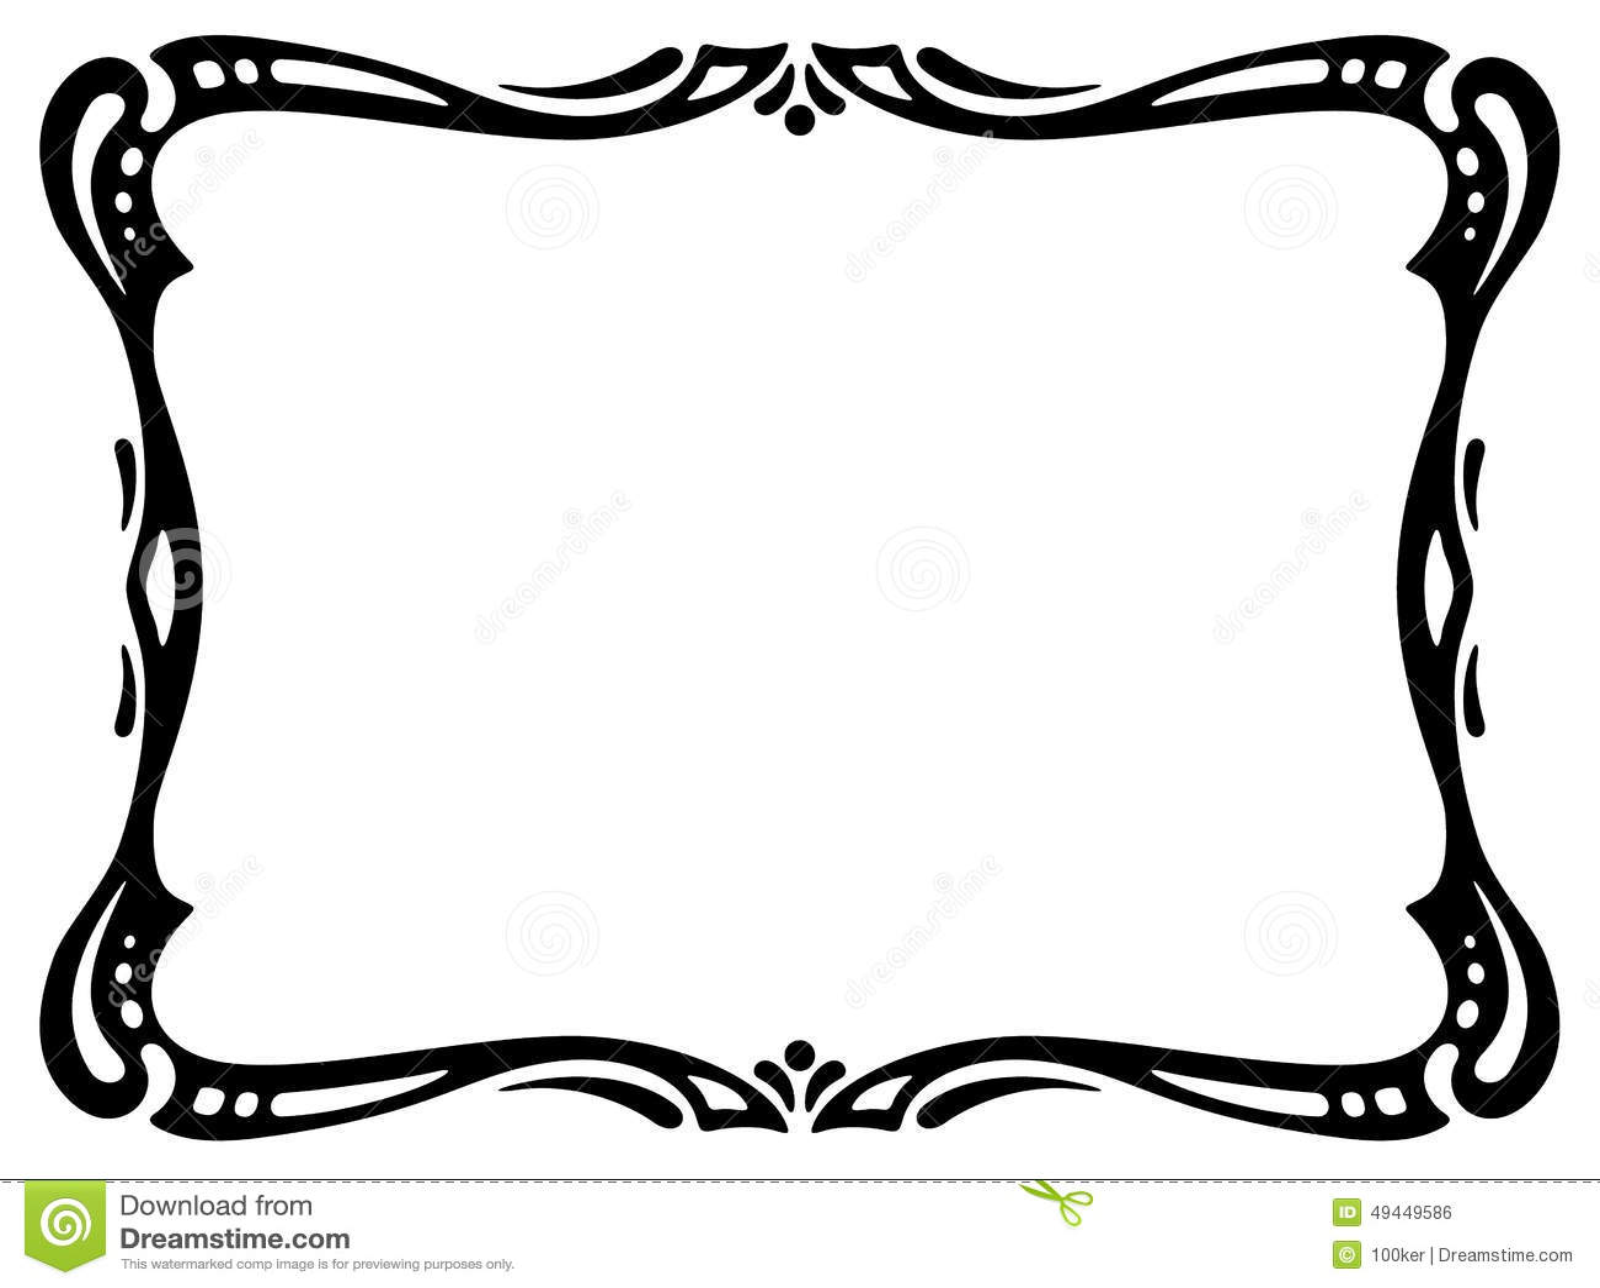 art nouveau black ornamental decorative frame stock vector rh dreamstime com ornamental vector art ornamental victorian shoes